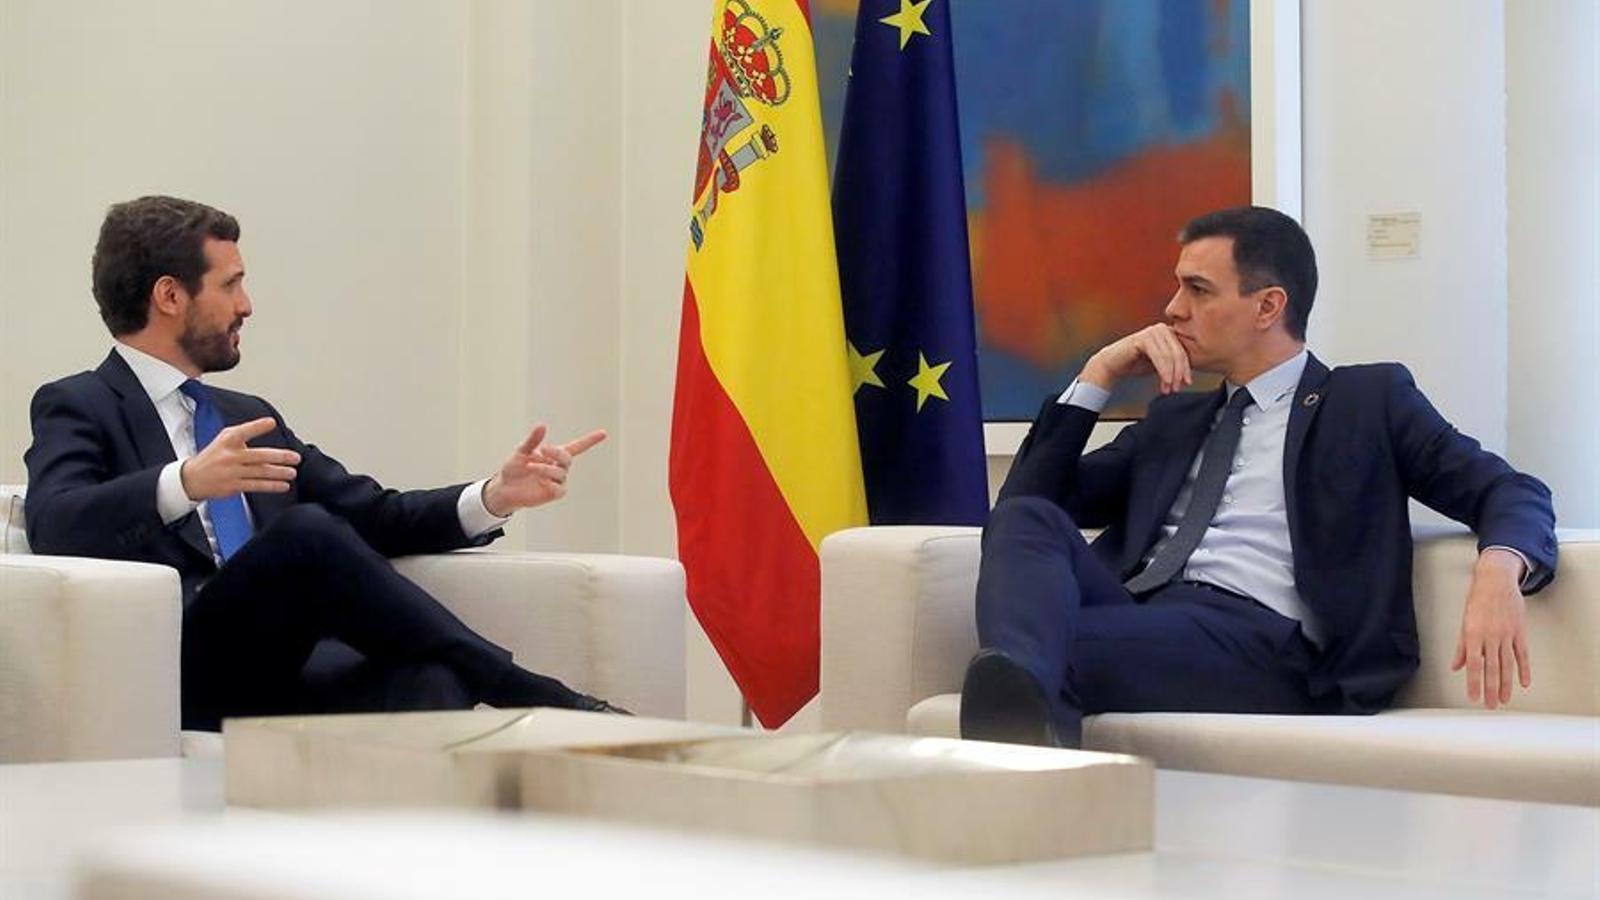 El president del govern espanyol, Pedro Sánchez, amb el líder del PP, Pablo Casado, a la Moncloa.